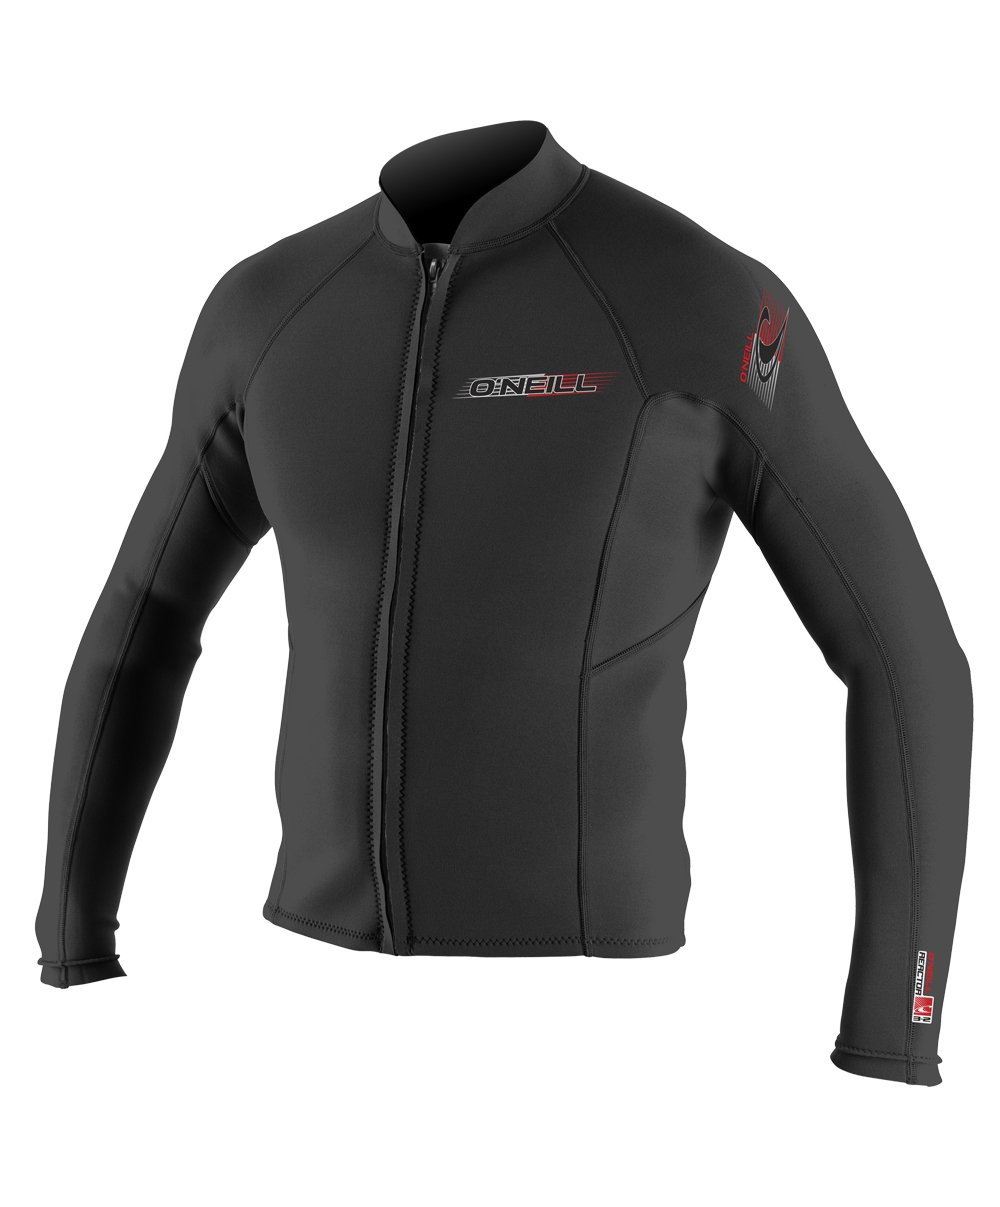 O'Neill Wetsuits Mens Superlite Jacket, Black/Black, Large